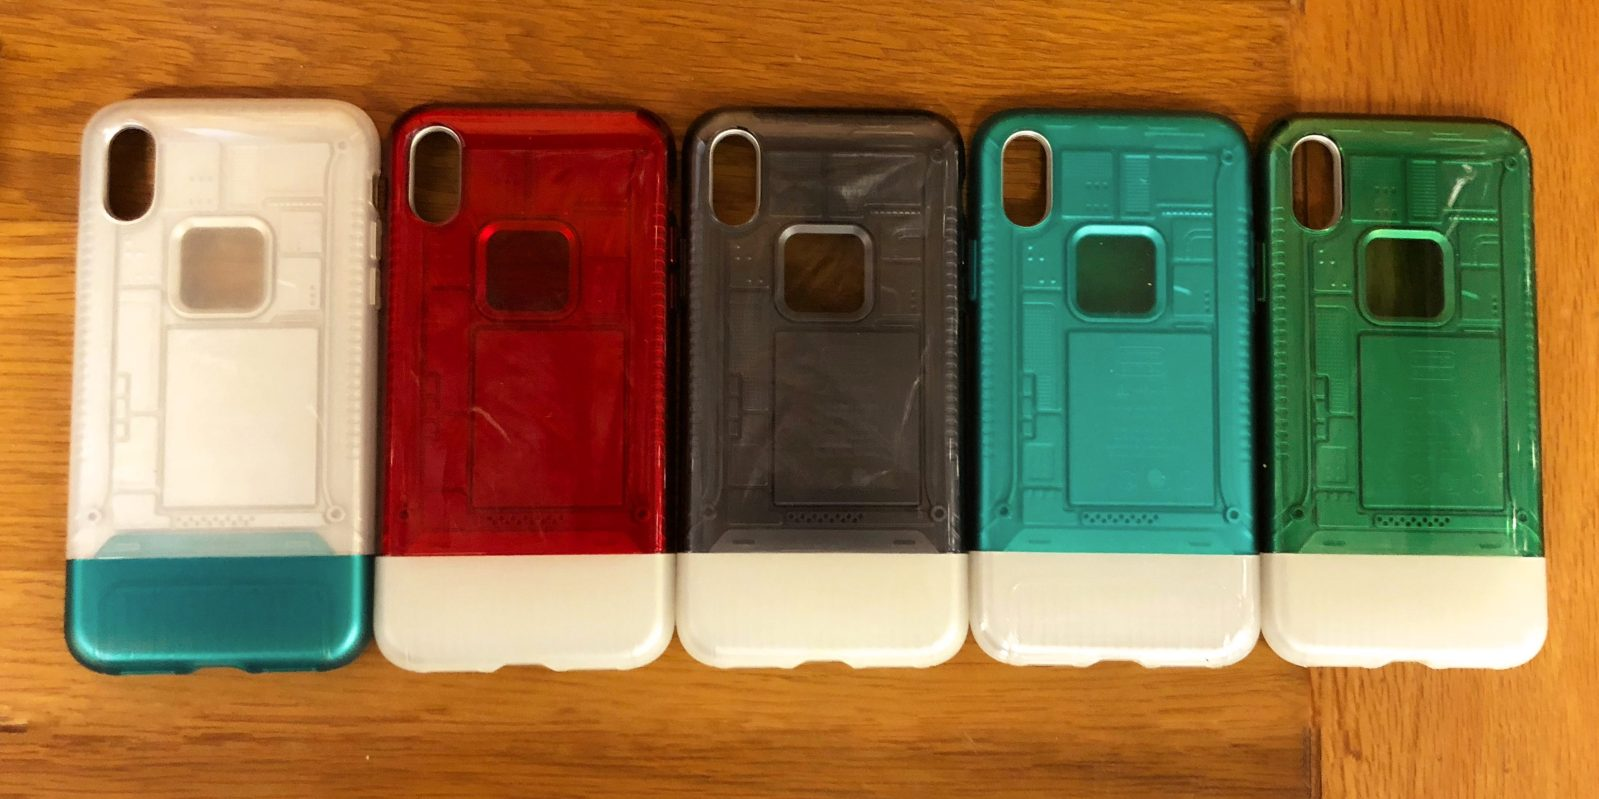 84e750670b Spigen announces special edition iPhone X cases echoing iMac G3 and  original iPhone design